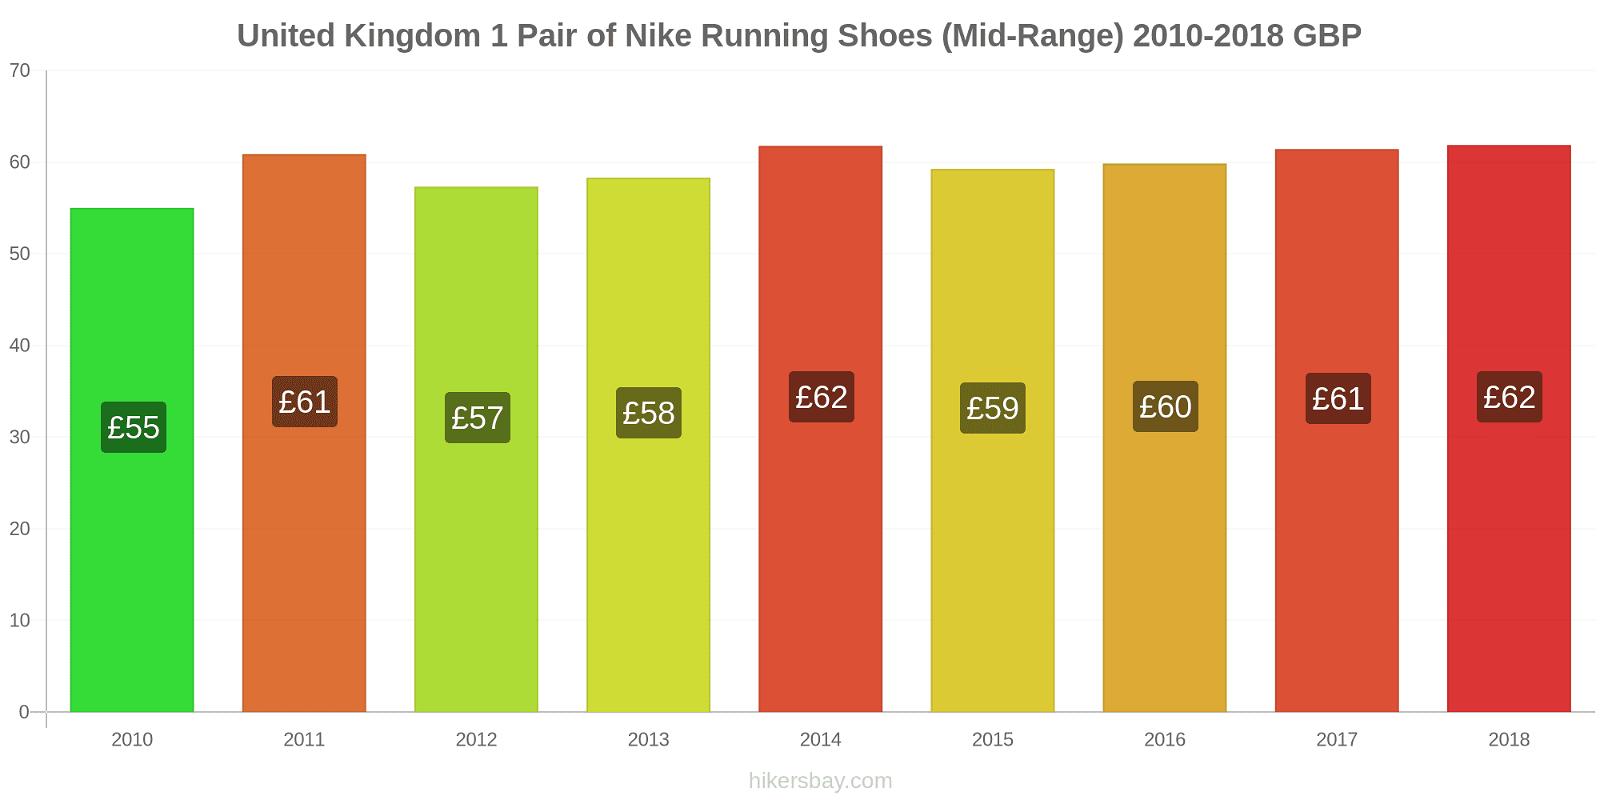 United Kingdom price changes 1 Pair of Nike Running Shoes (Mid-Range) hikersbay.com